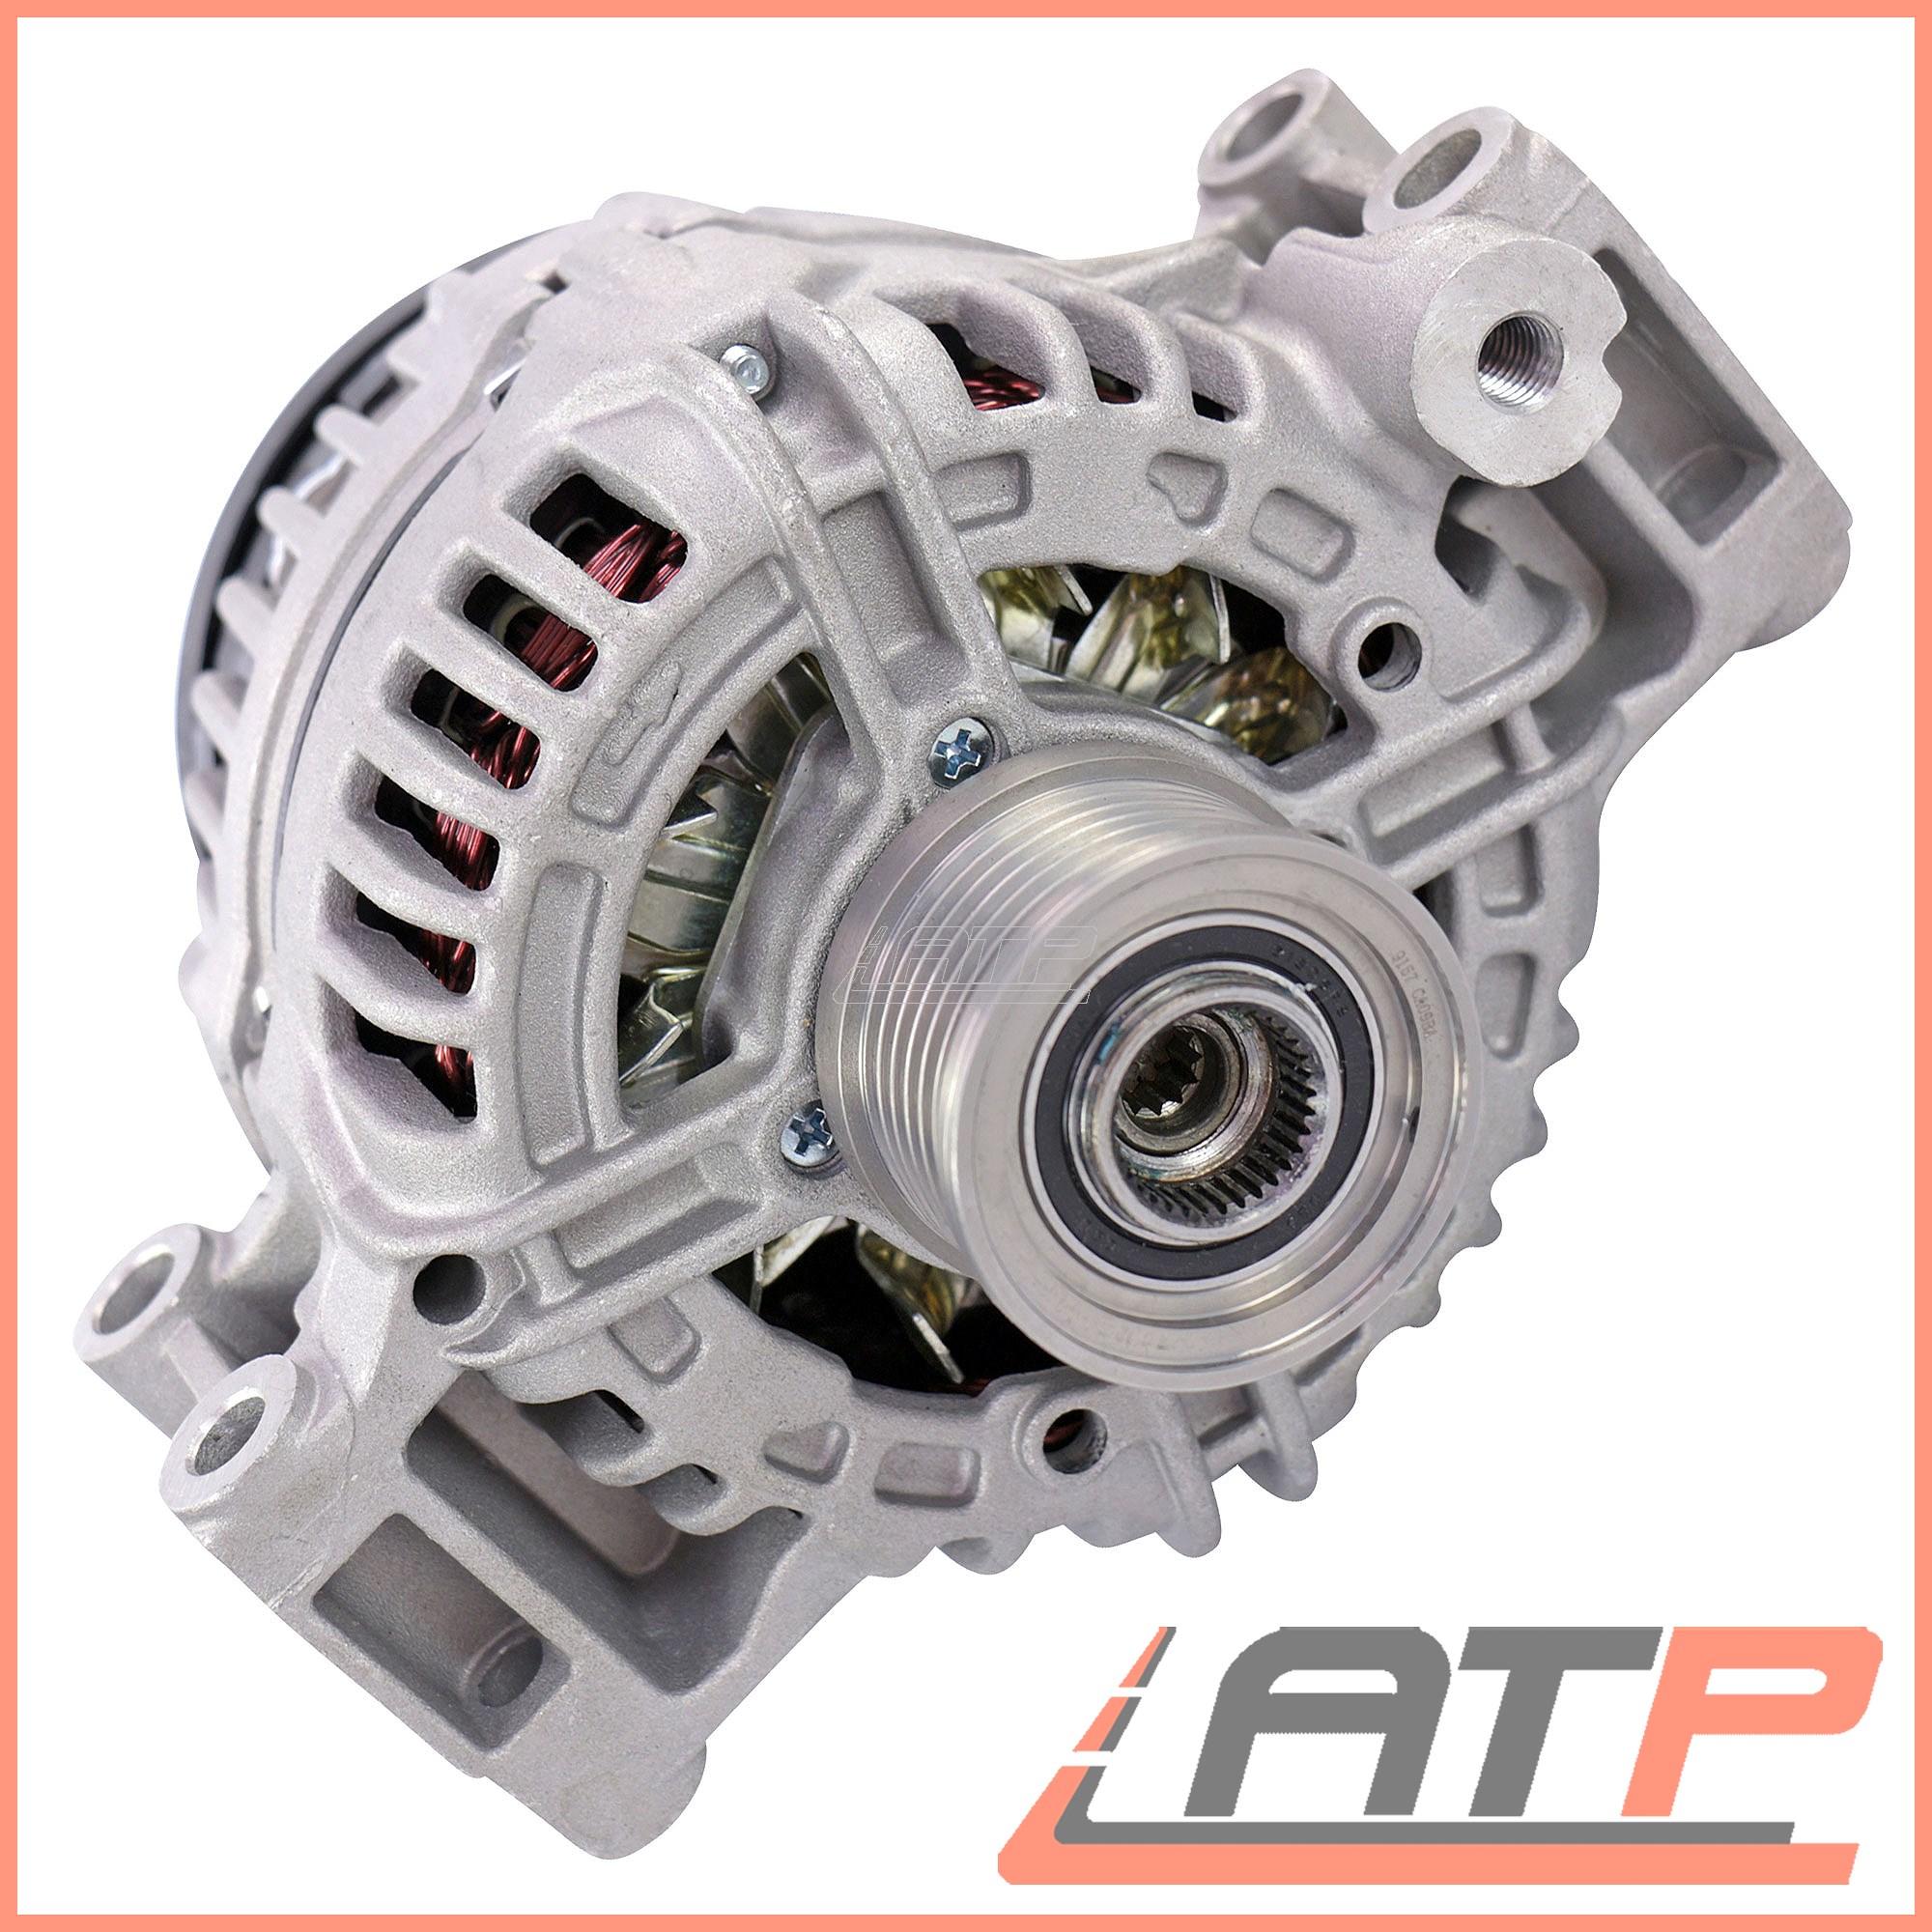 Auto Replacement Parts Overrunning Alternator Pulley For Bmw 1 E81 E87 E88 116i 118i 120i E46 E90 E91 E92 E93 316 318 320 E60 520i X1 E84 Z4 E85